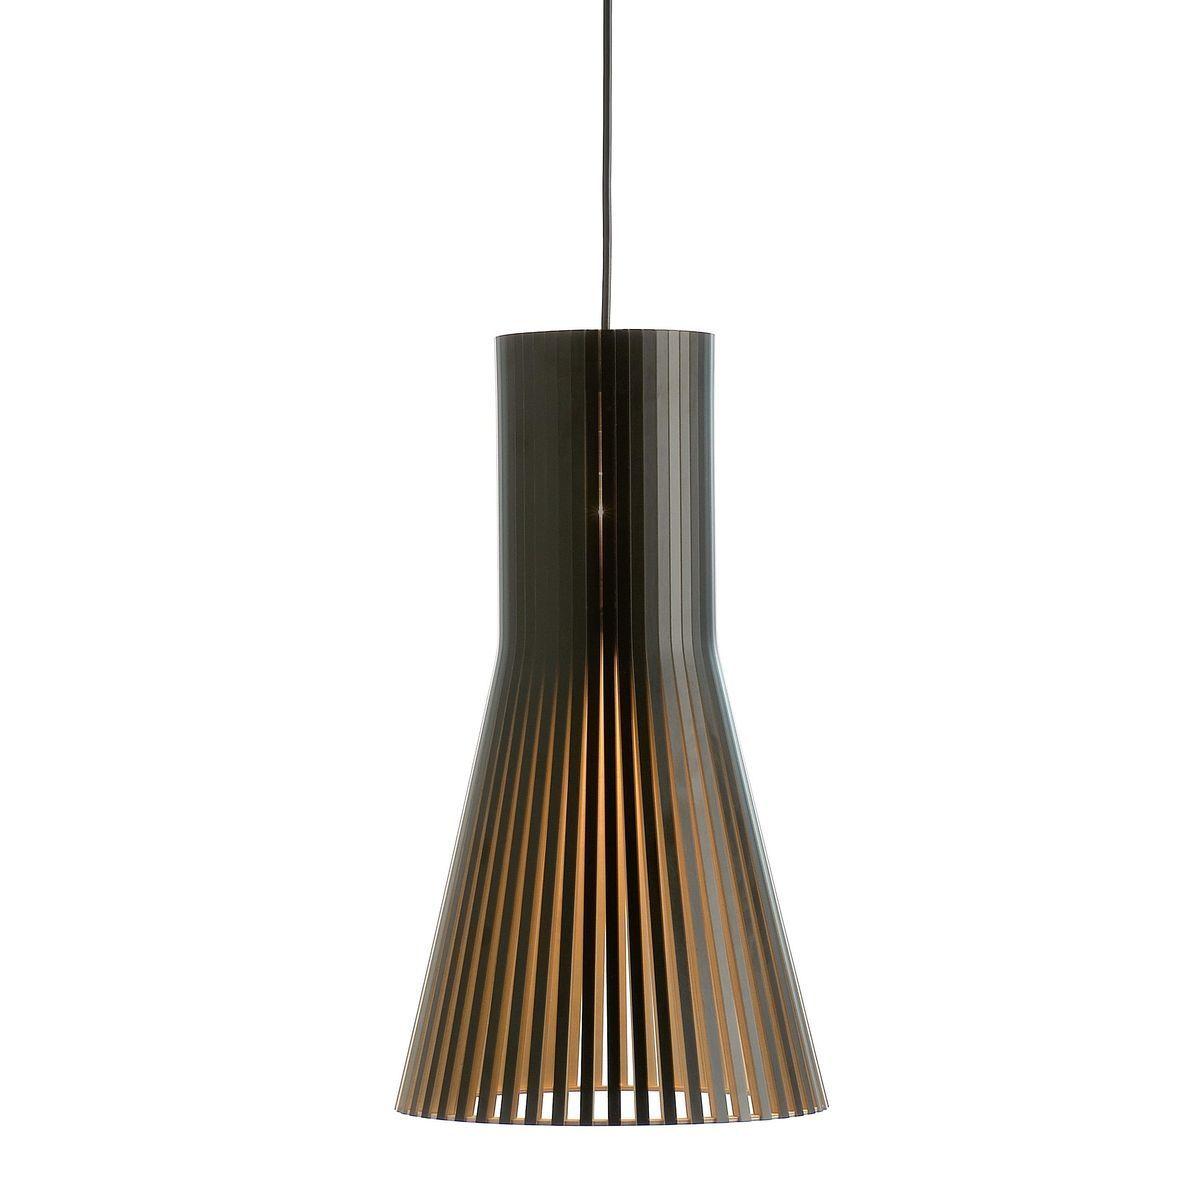 secto 4201 suspension lamp secto design. Black Bedroom Furniture Sets. Home Design Ideas